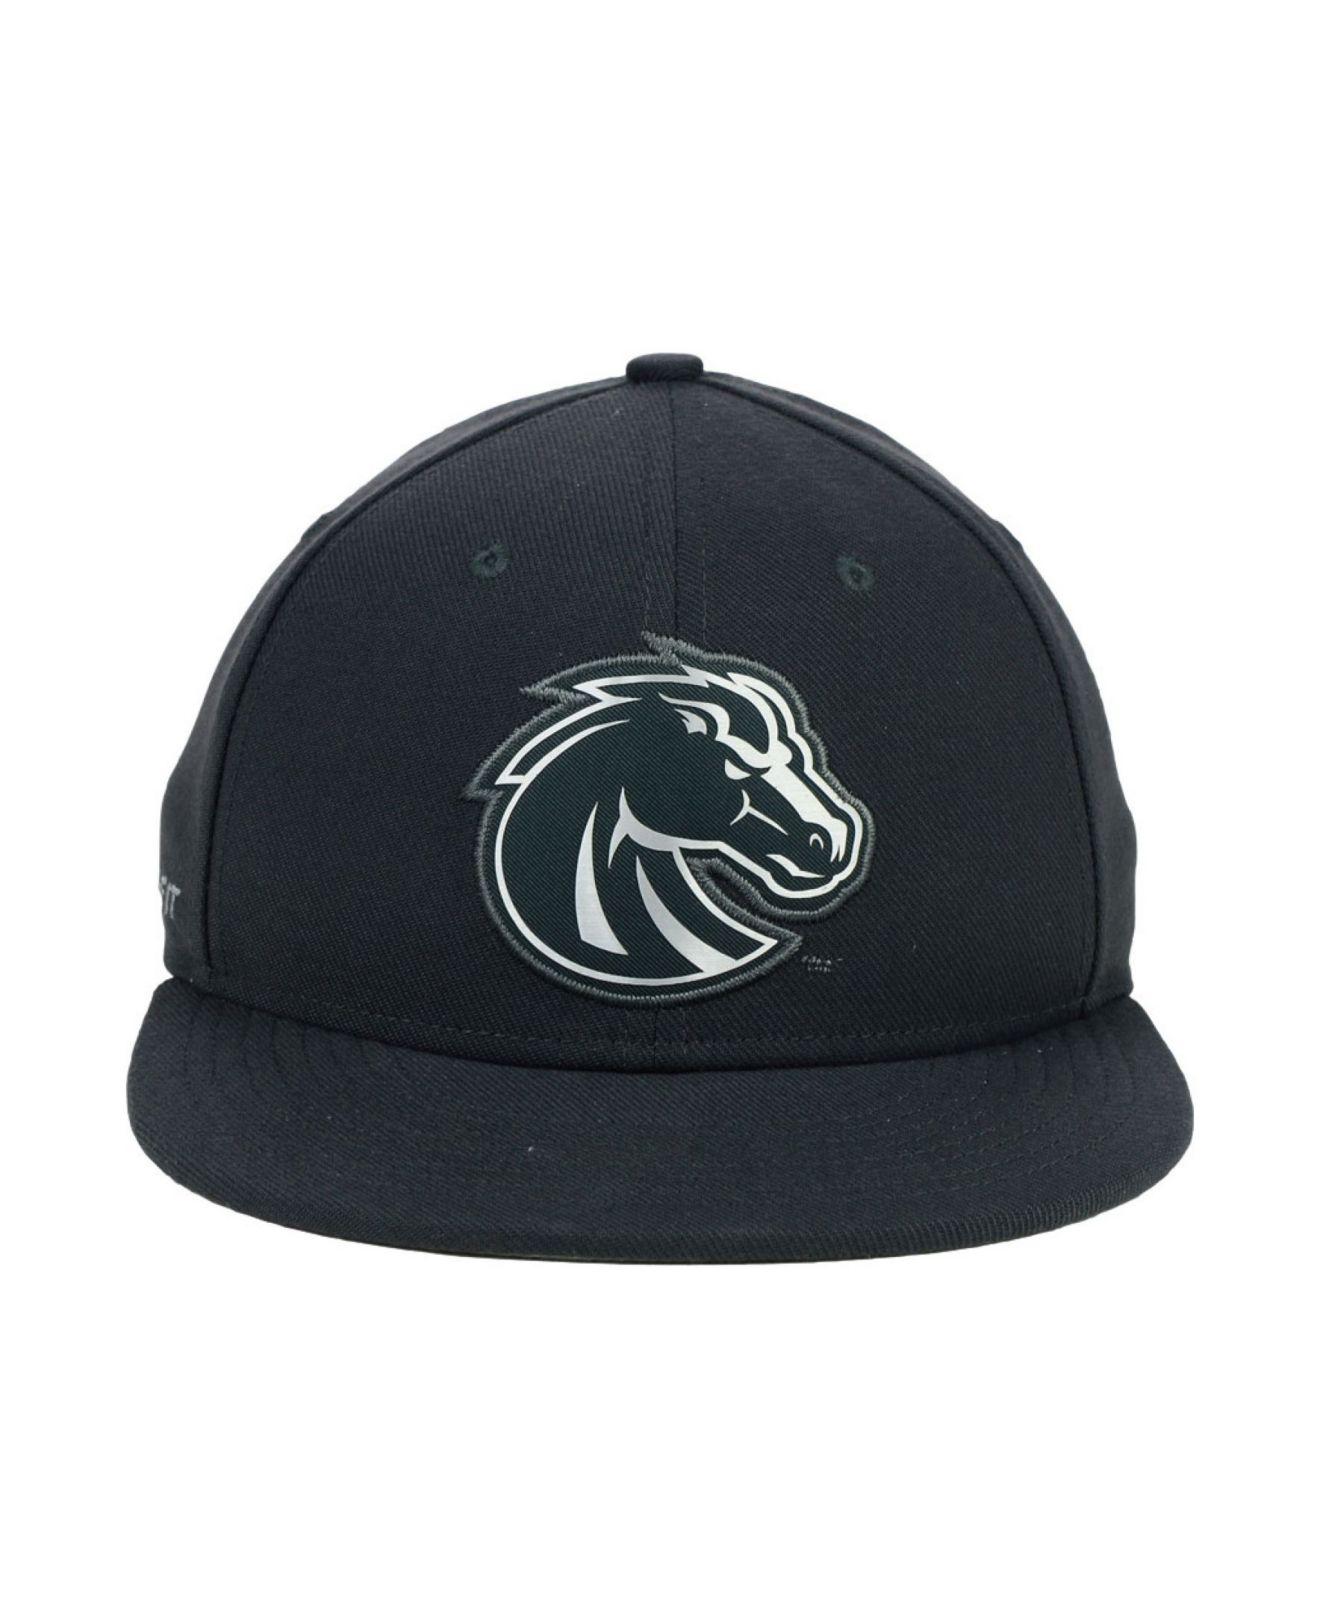 huge discount 7771f a8173 Nike Boise State Broncos True Platinum Swooshflex Cap in Gray for ...